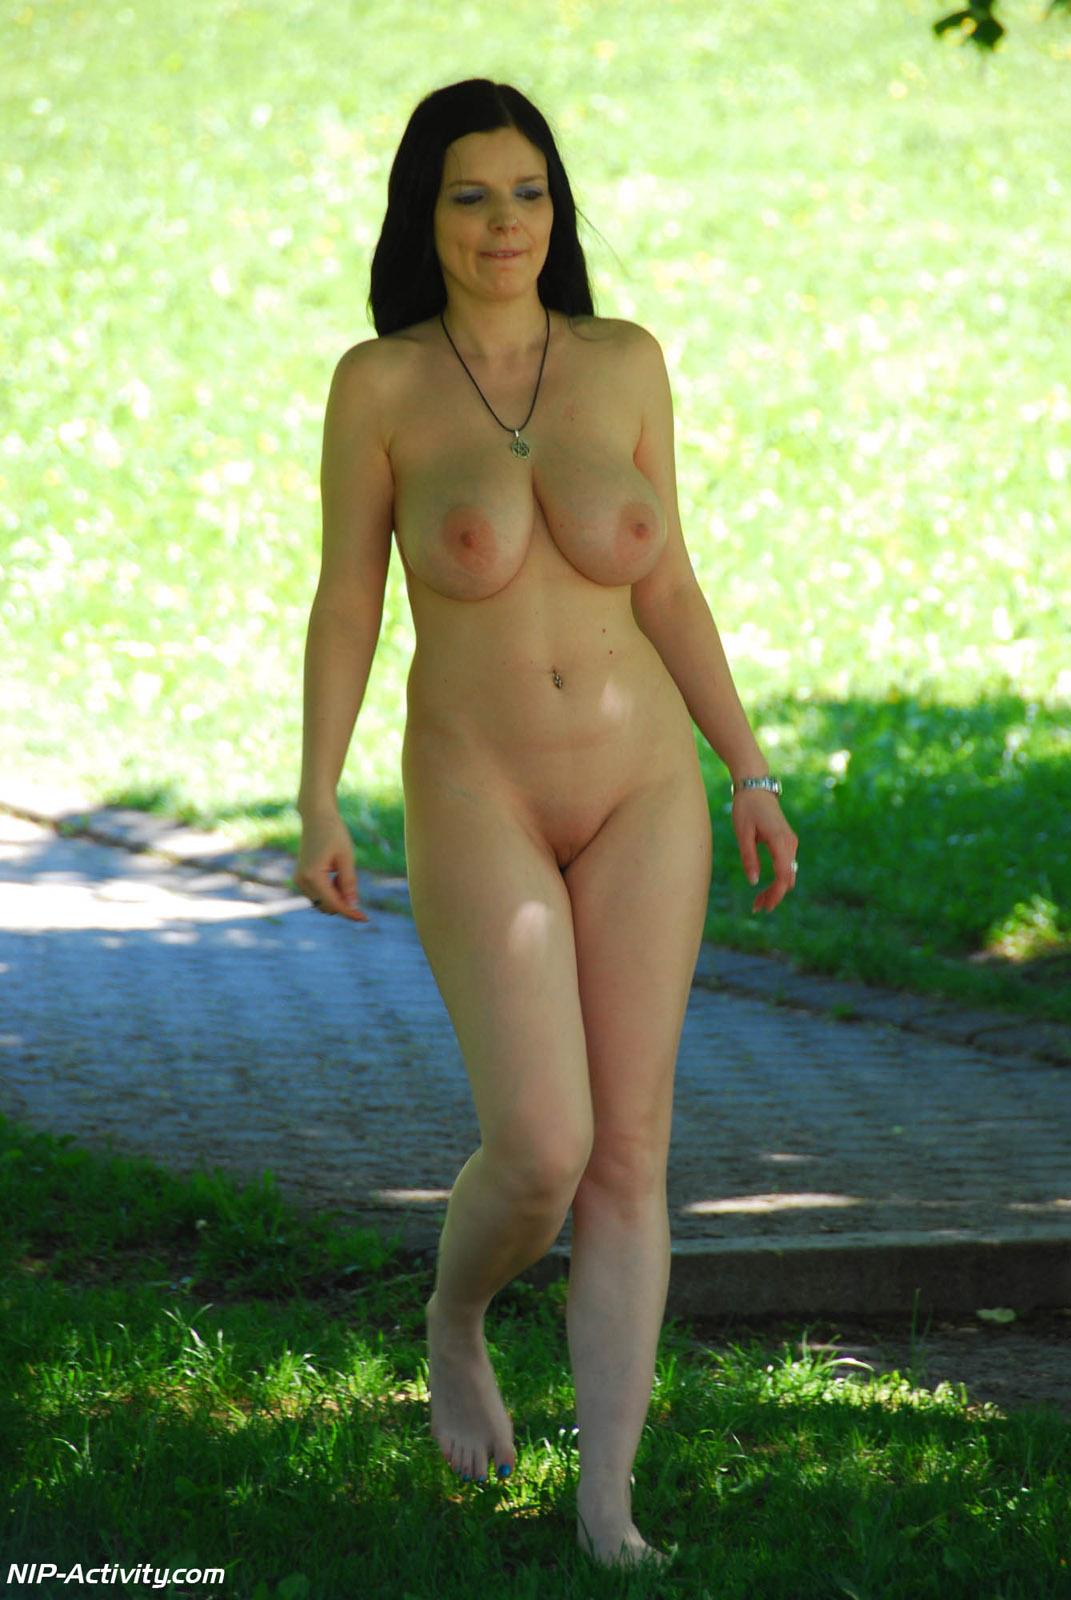 odiya-nude-lady-russian-sex-videos-chat